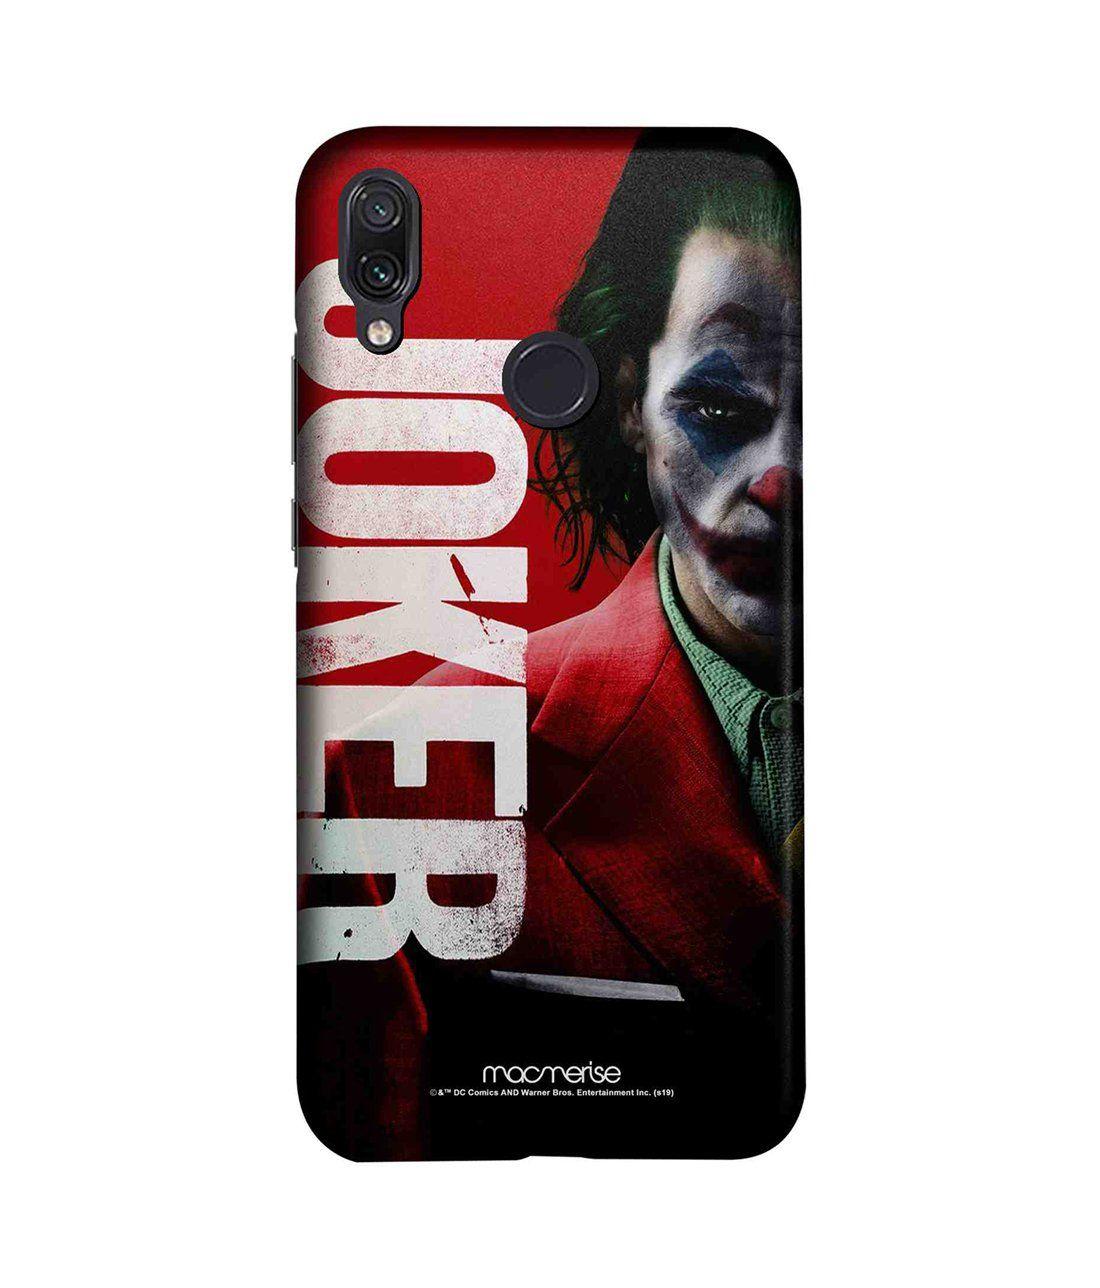 Clown Prince - Sleek Phone Case for Xiaomi Redmi Note 7 Pro